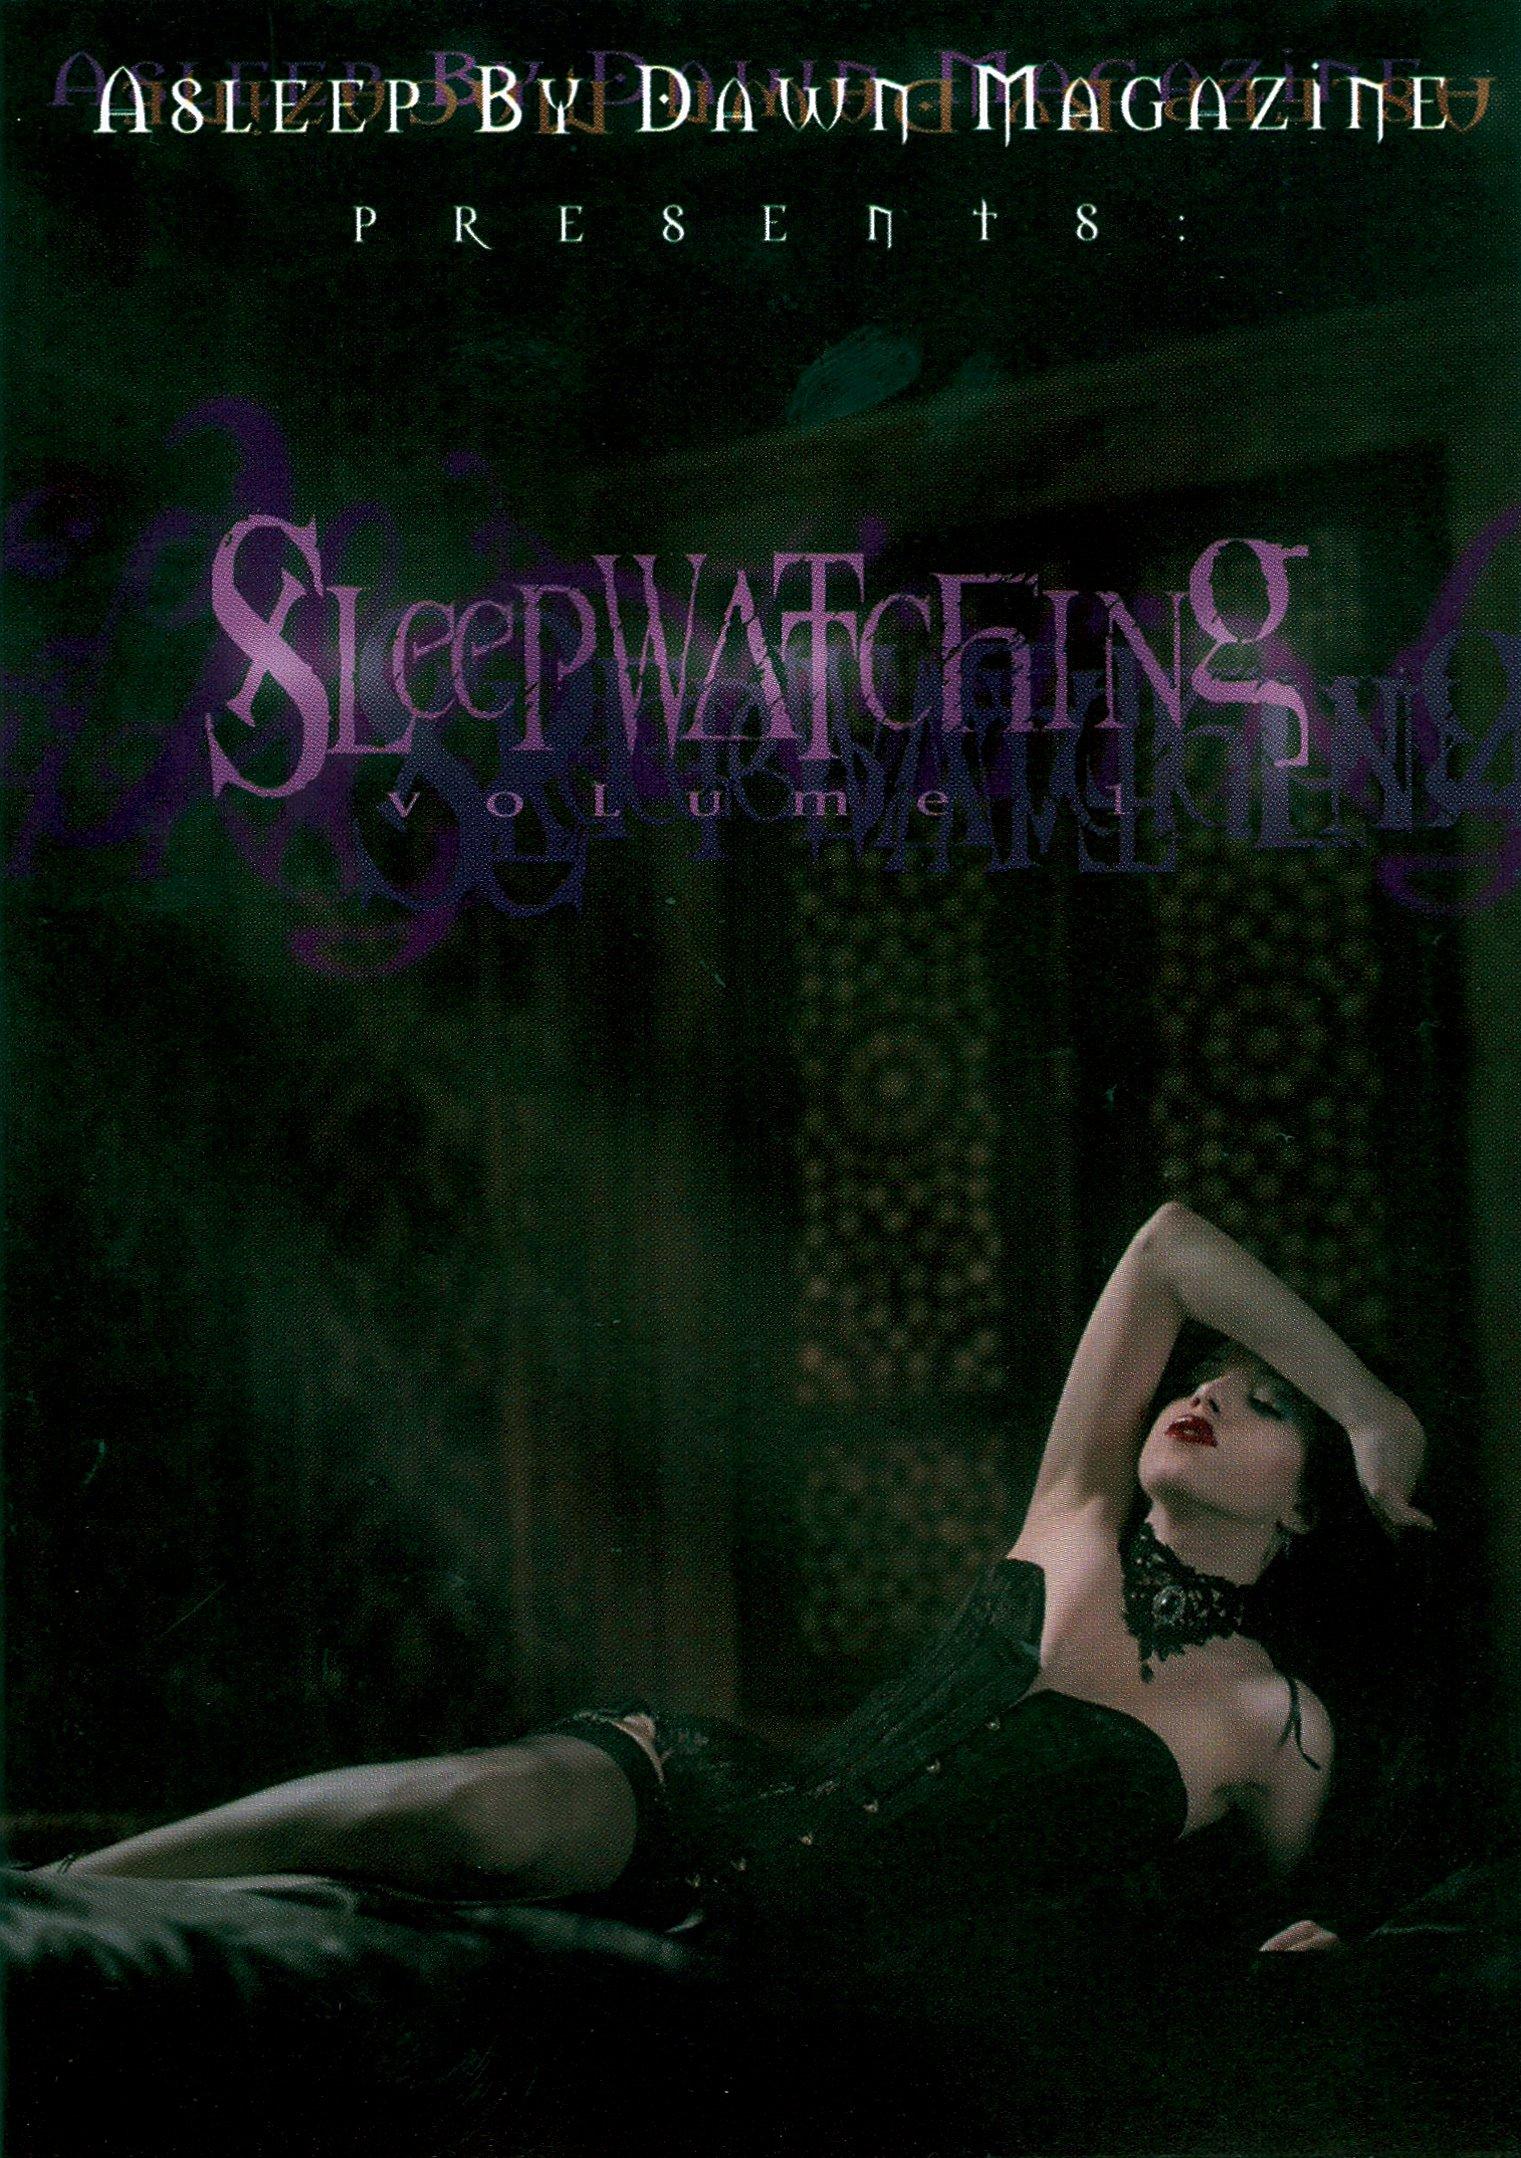 Asleep by Dawn - Sleepwatching: Volume 1 (DVD)